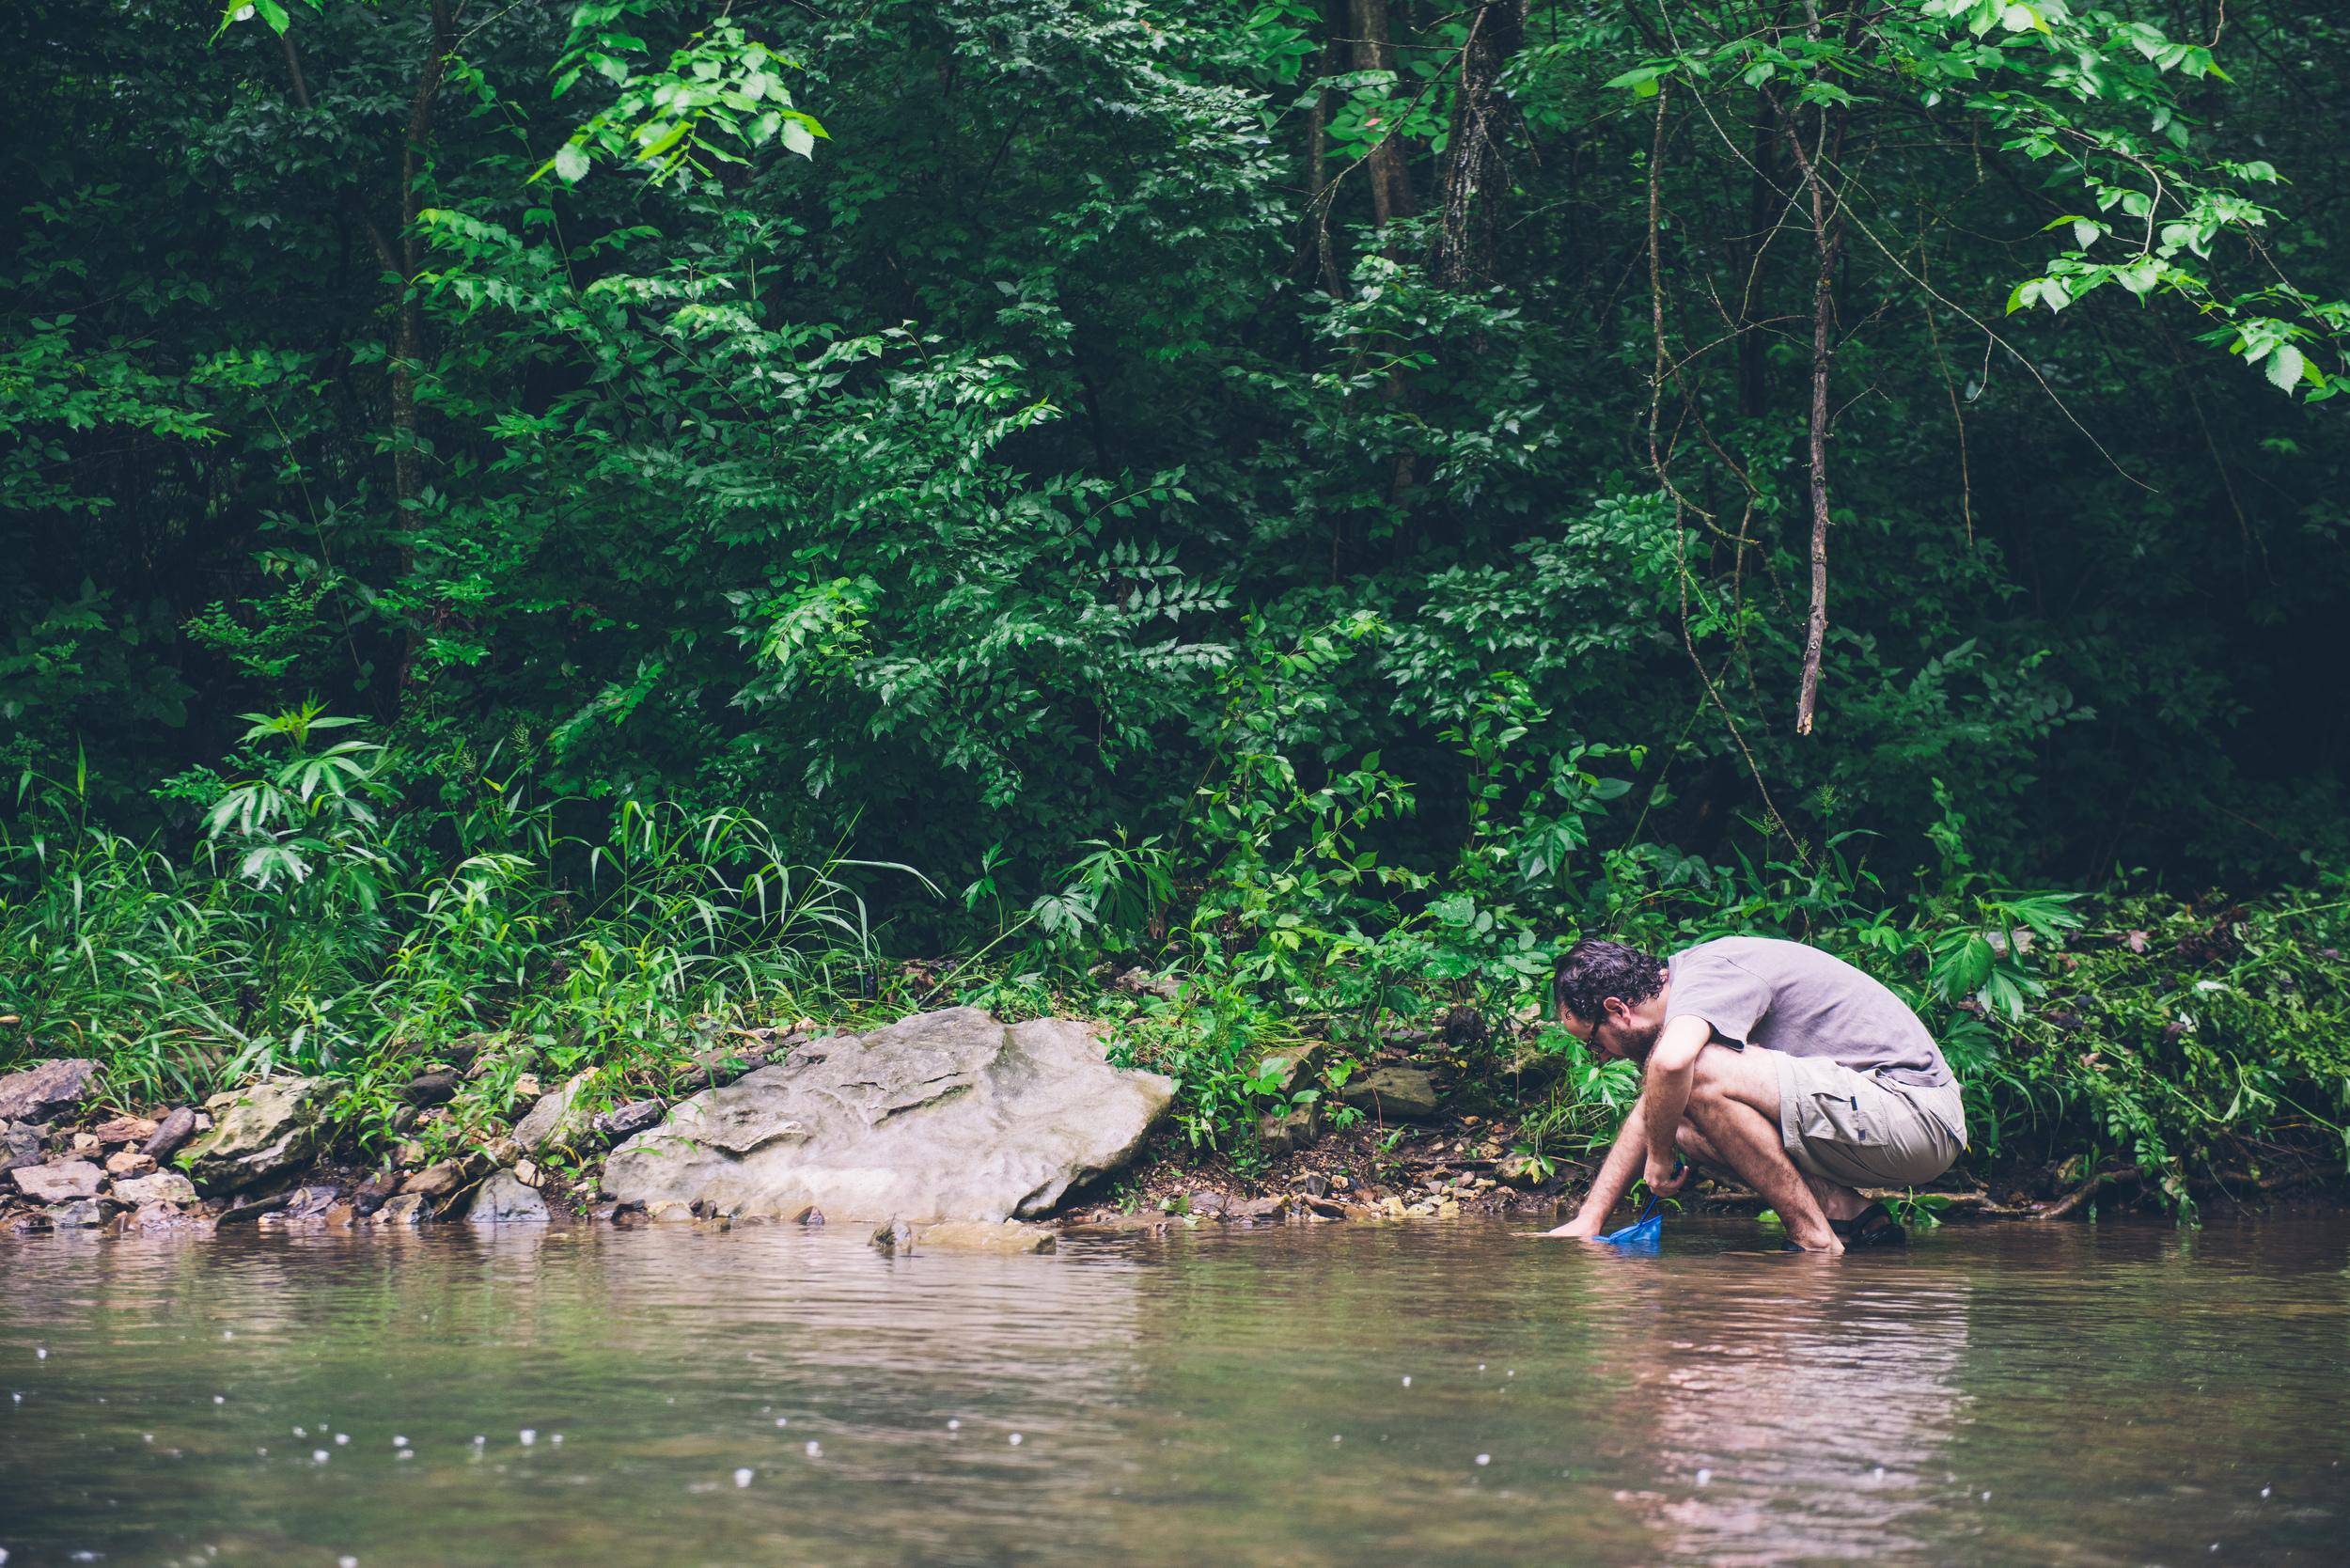 Looking for crayfish - Arkansas